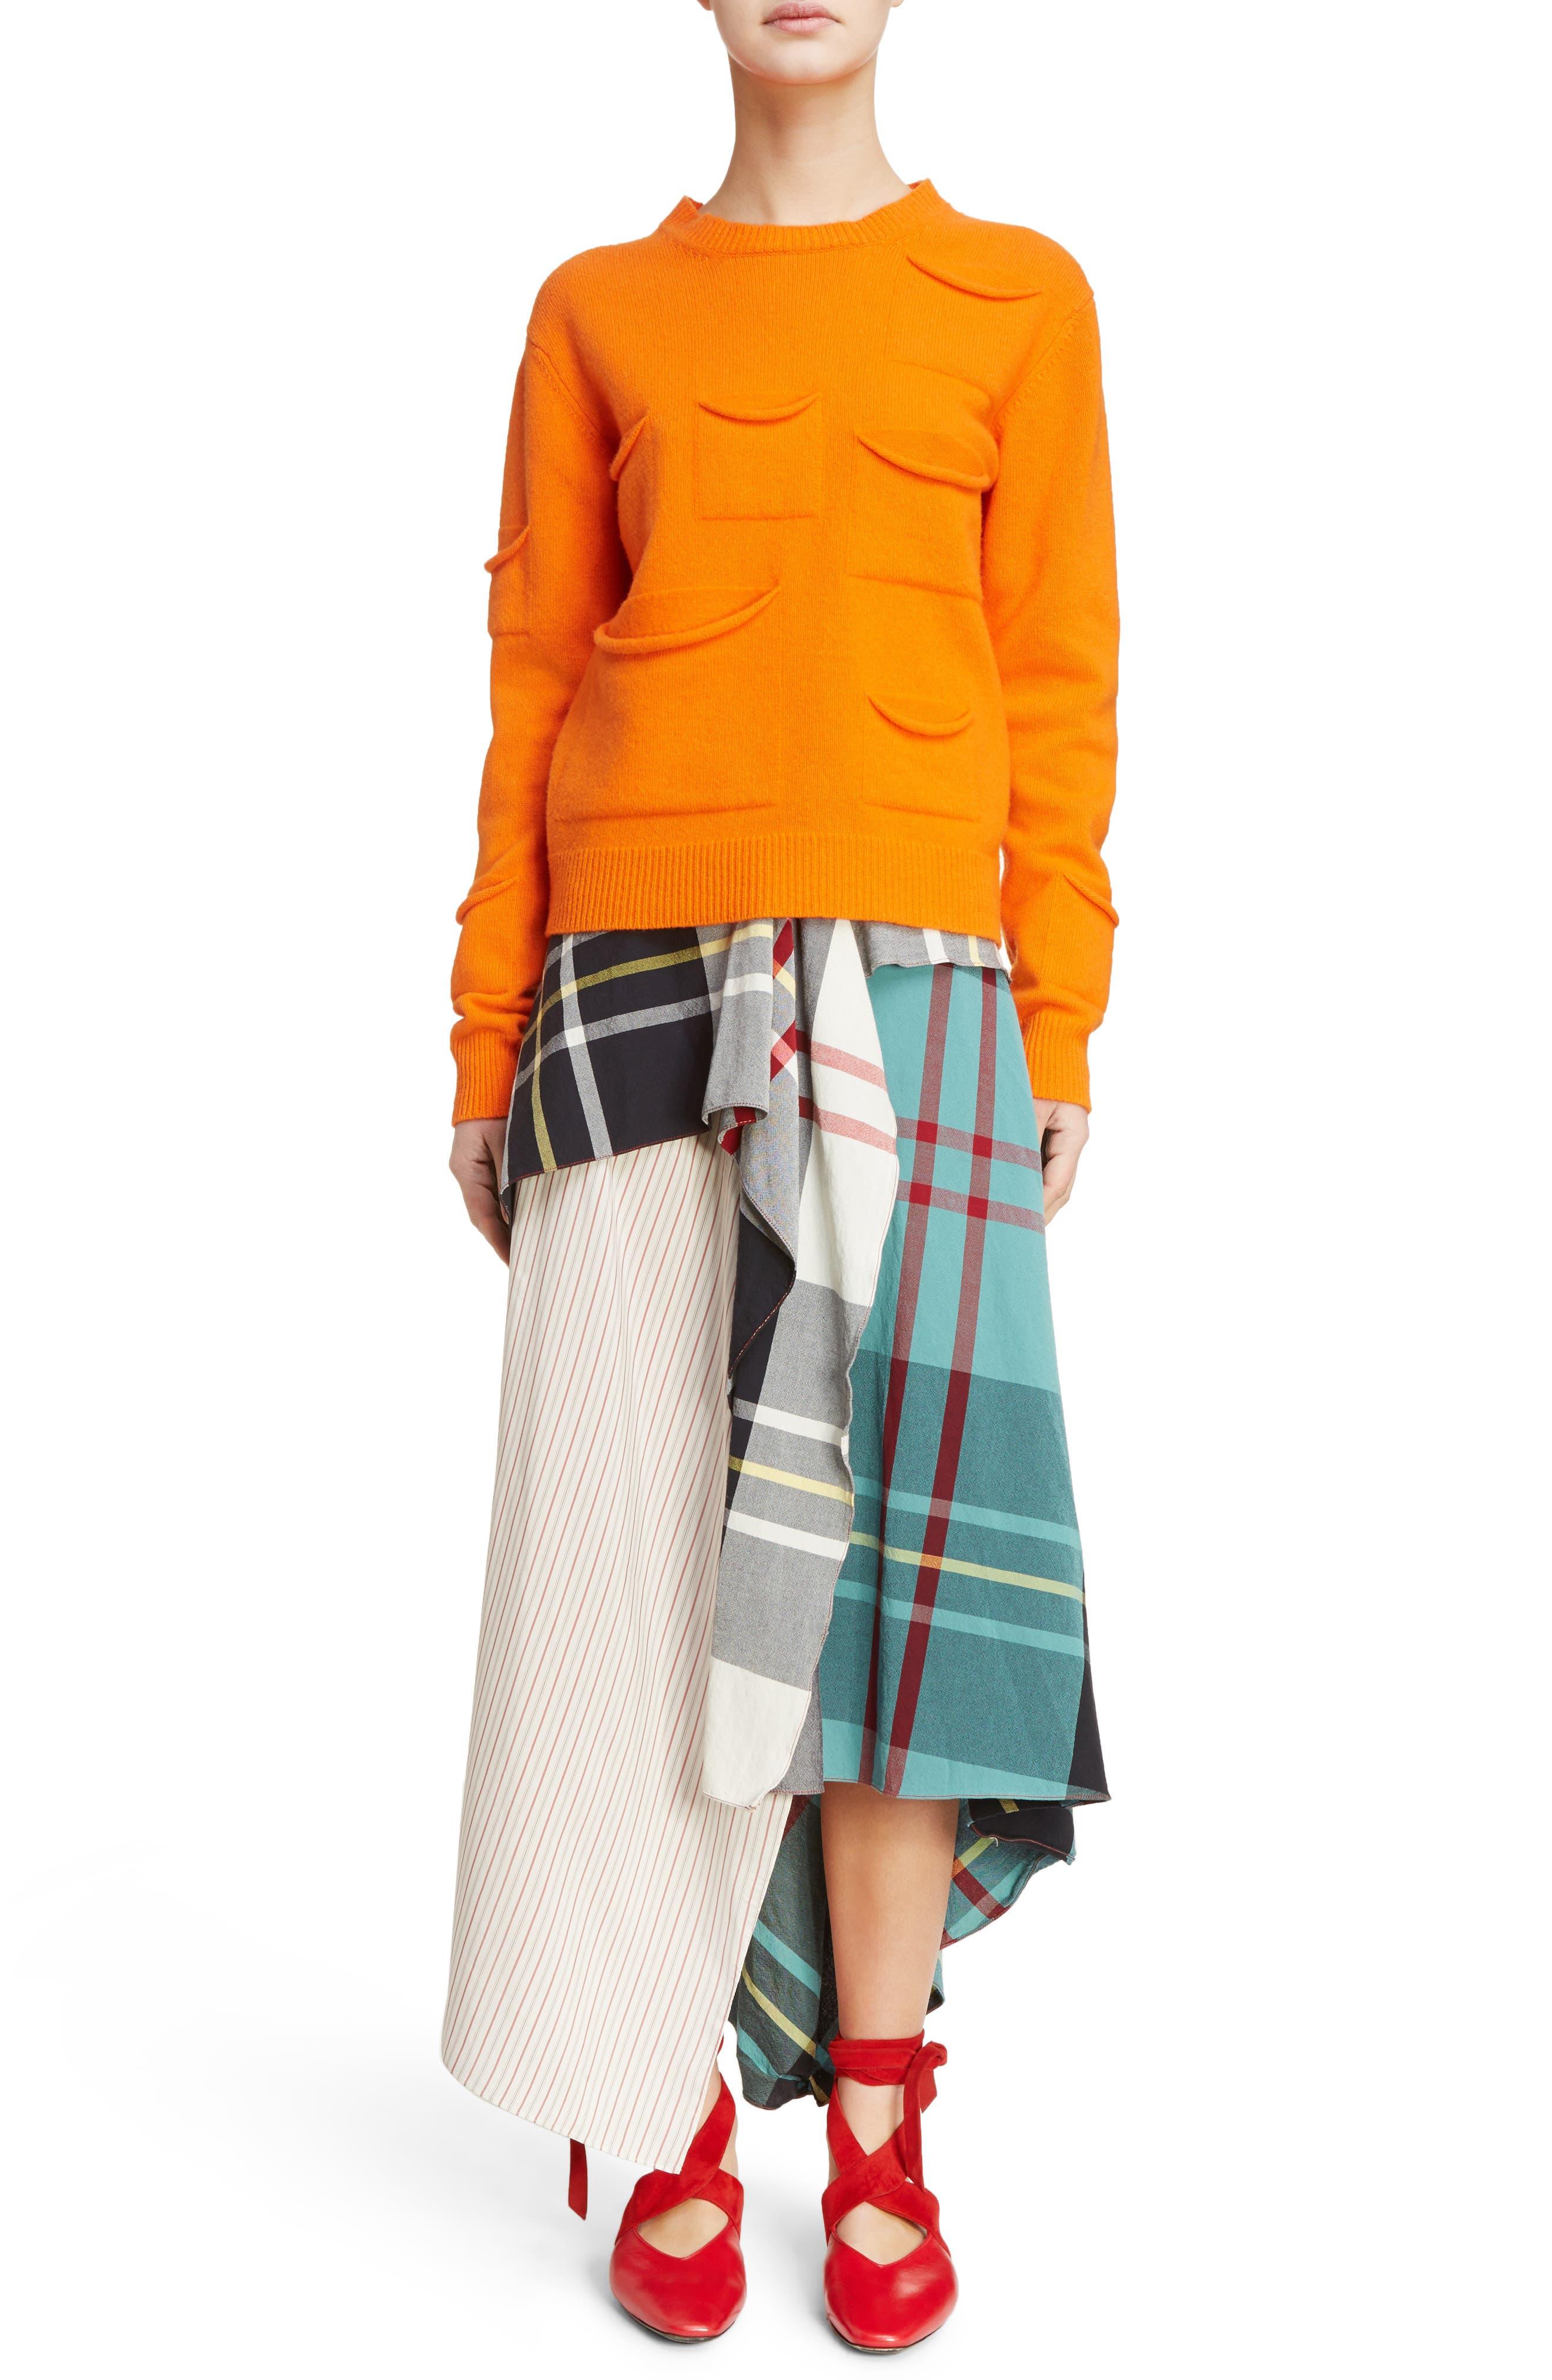 J.W.ANDERSON Multi Pocket Crewneck Sweater,                             Alternate thumbnail 6, color,                             Tangerine